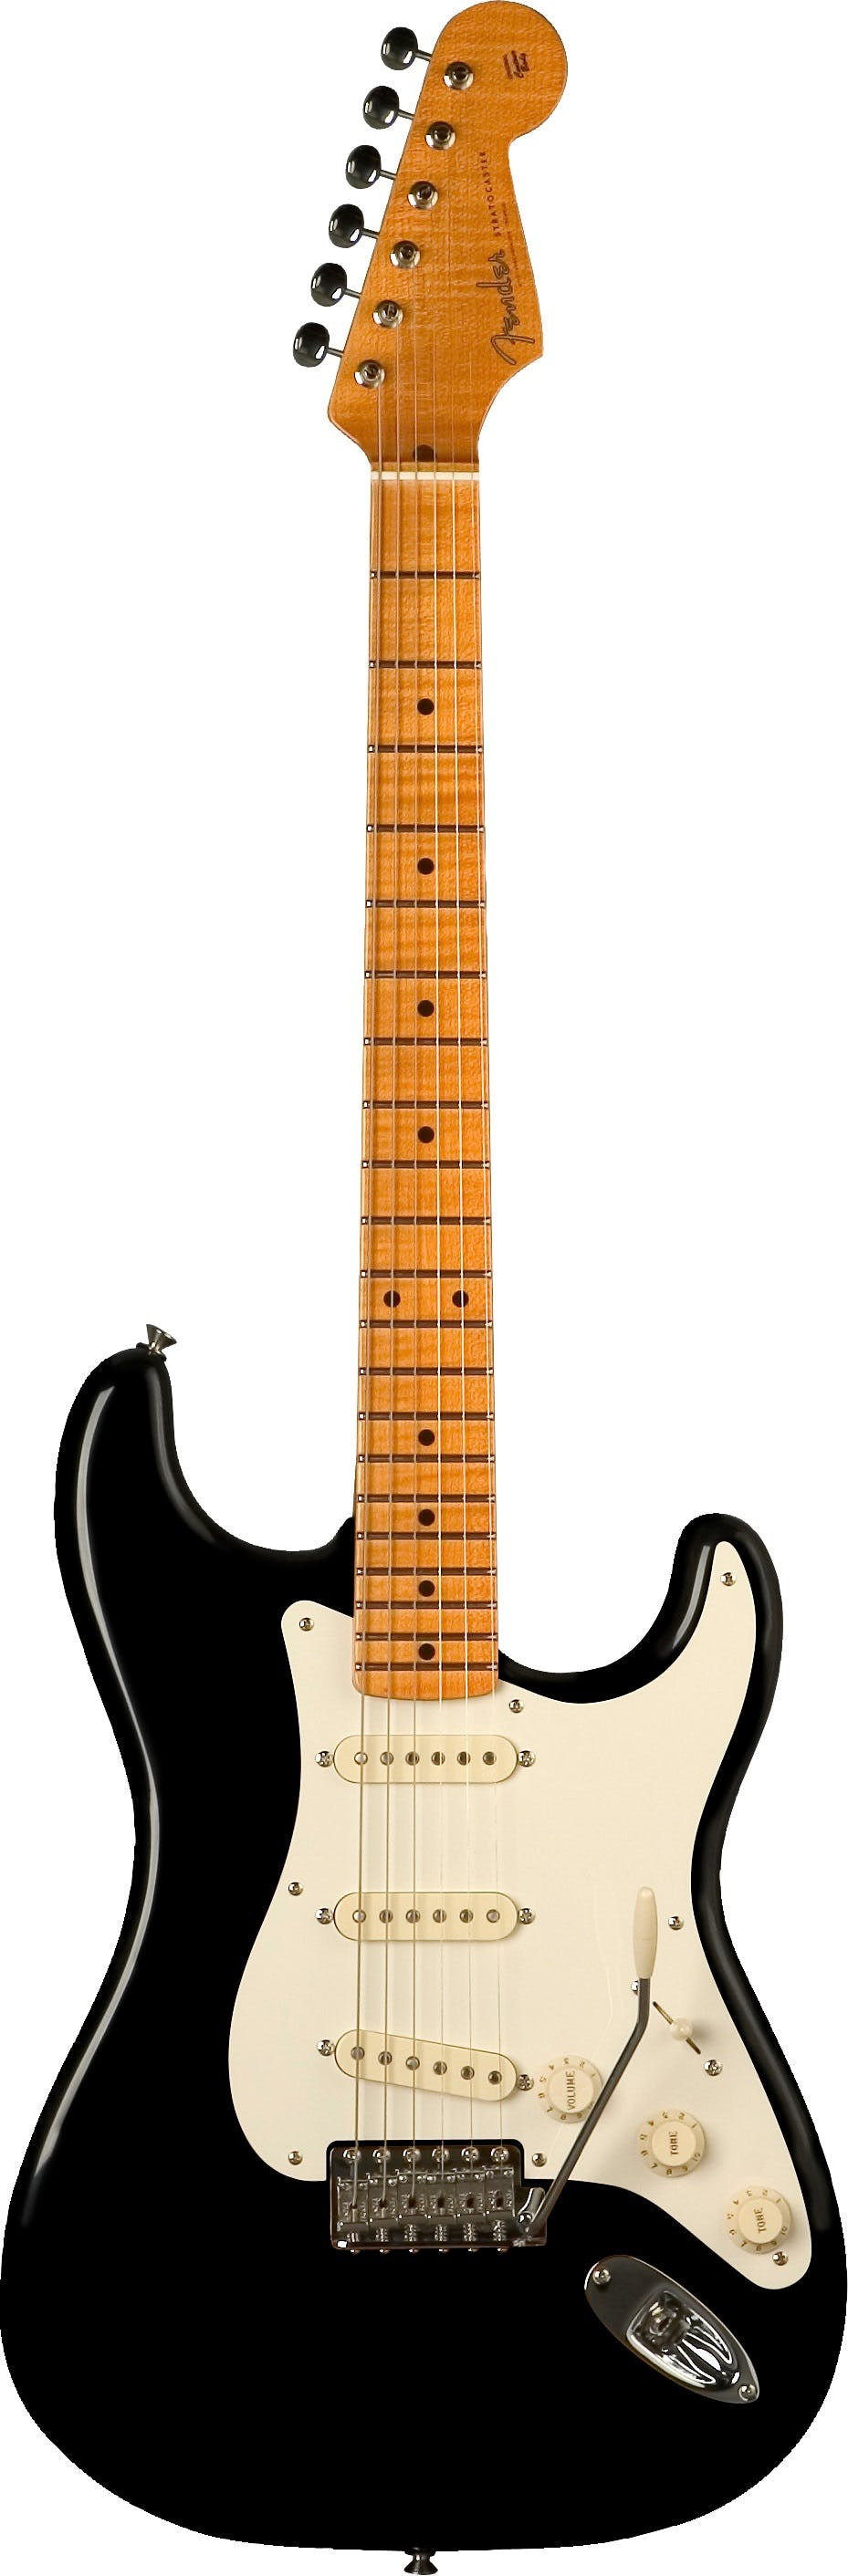 Eric Johnson Strat Wiring Page 1 Love Schematic Diagrams Fender Stratocaster Diagram In Black Maple Fretboard Guitar